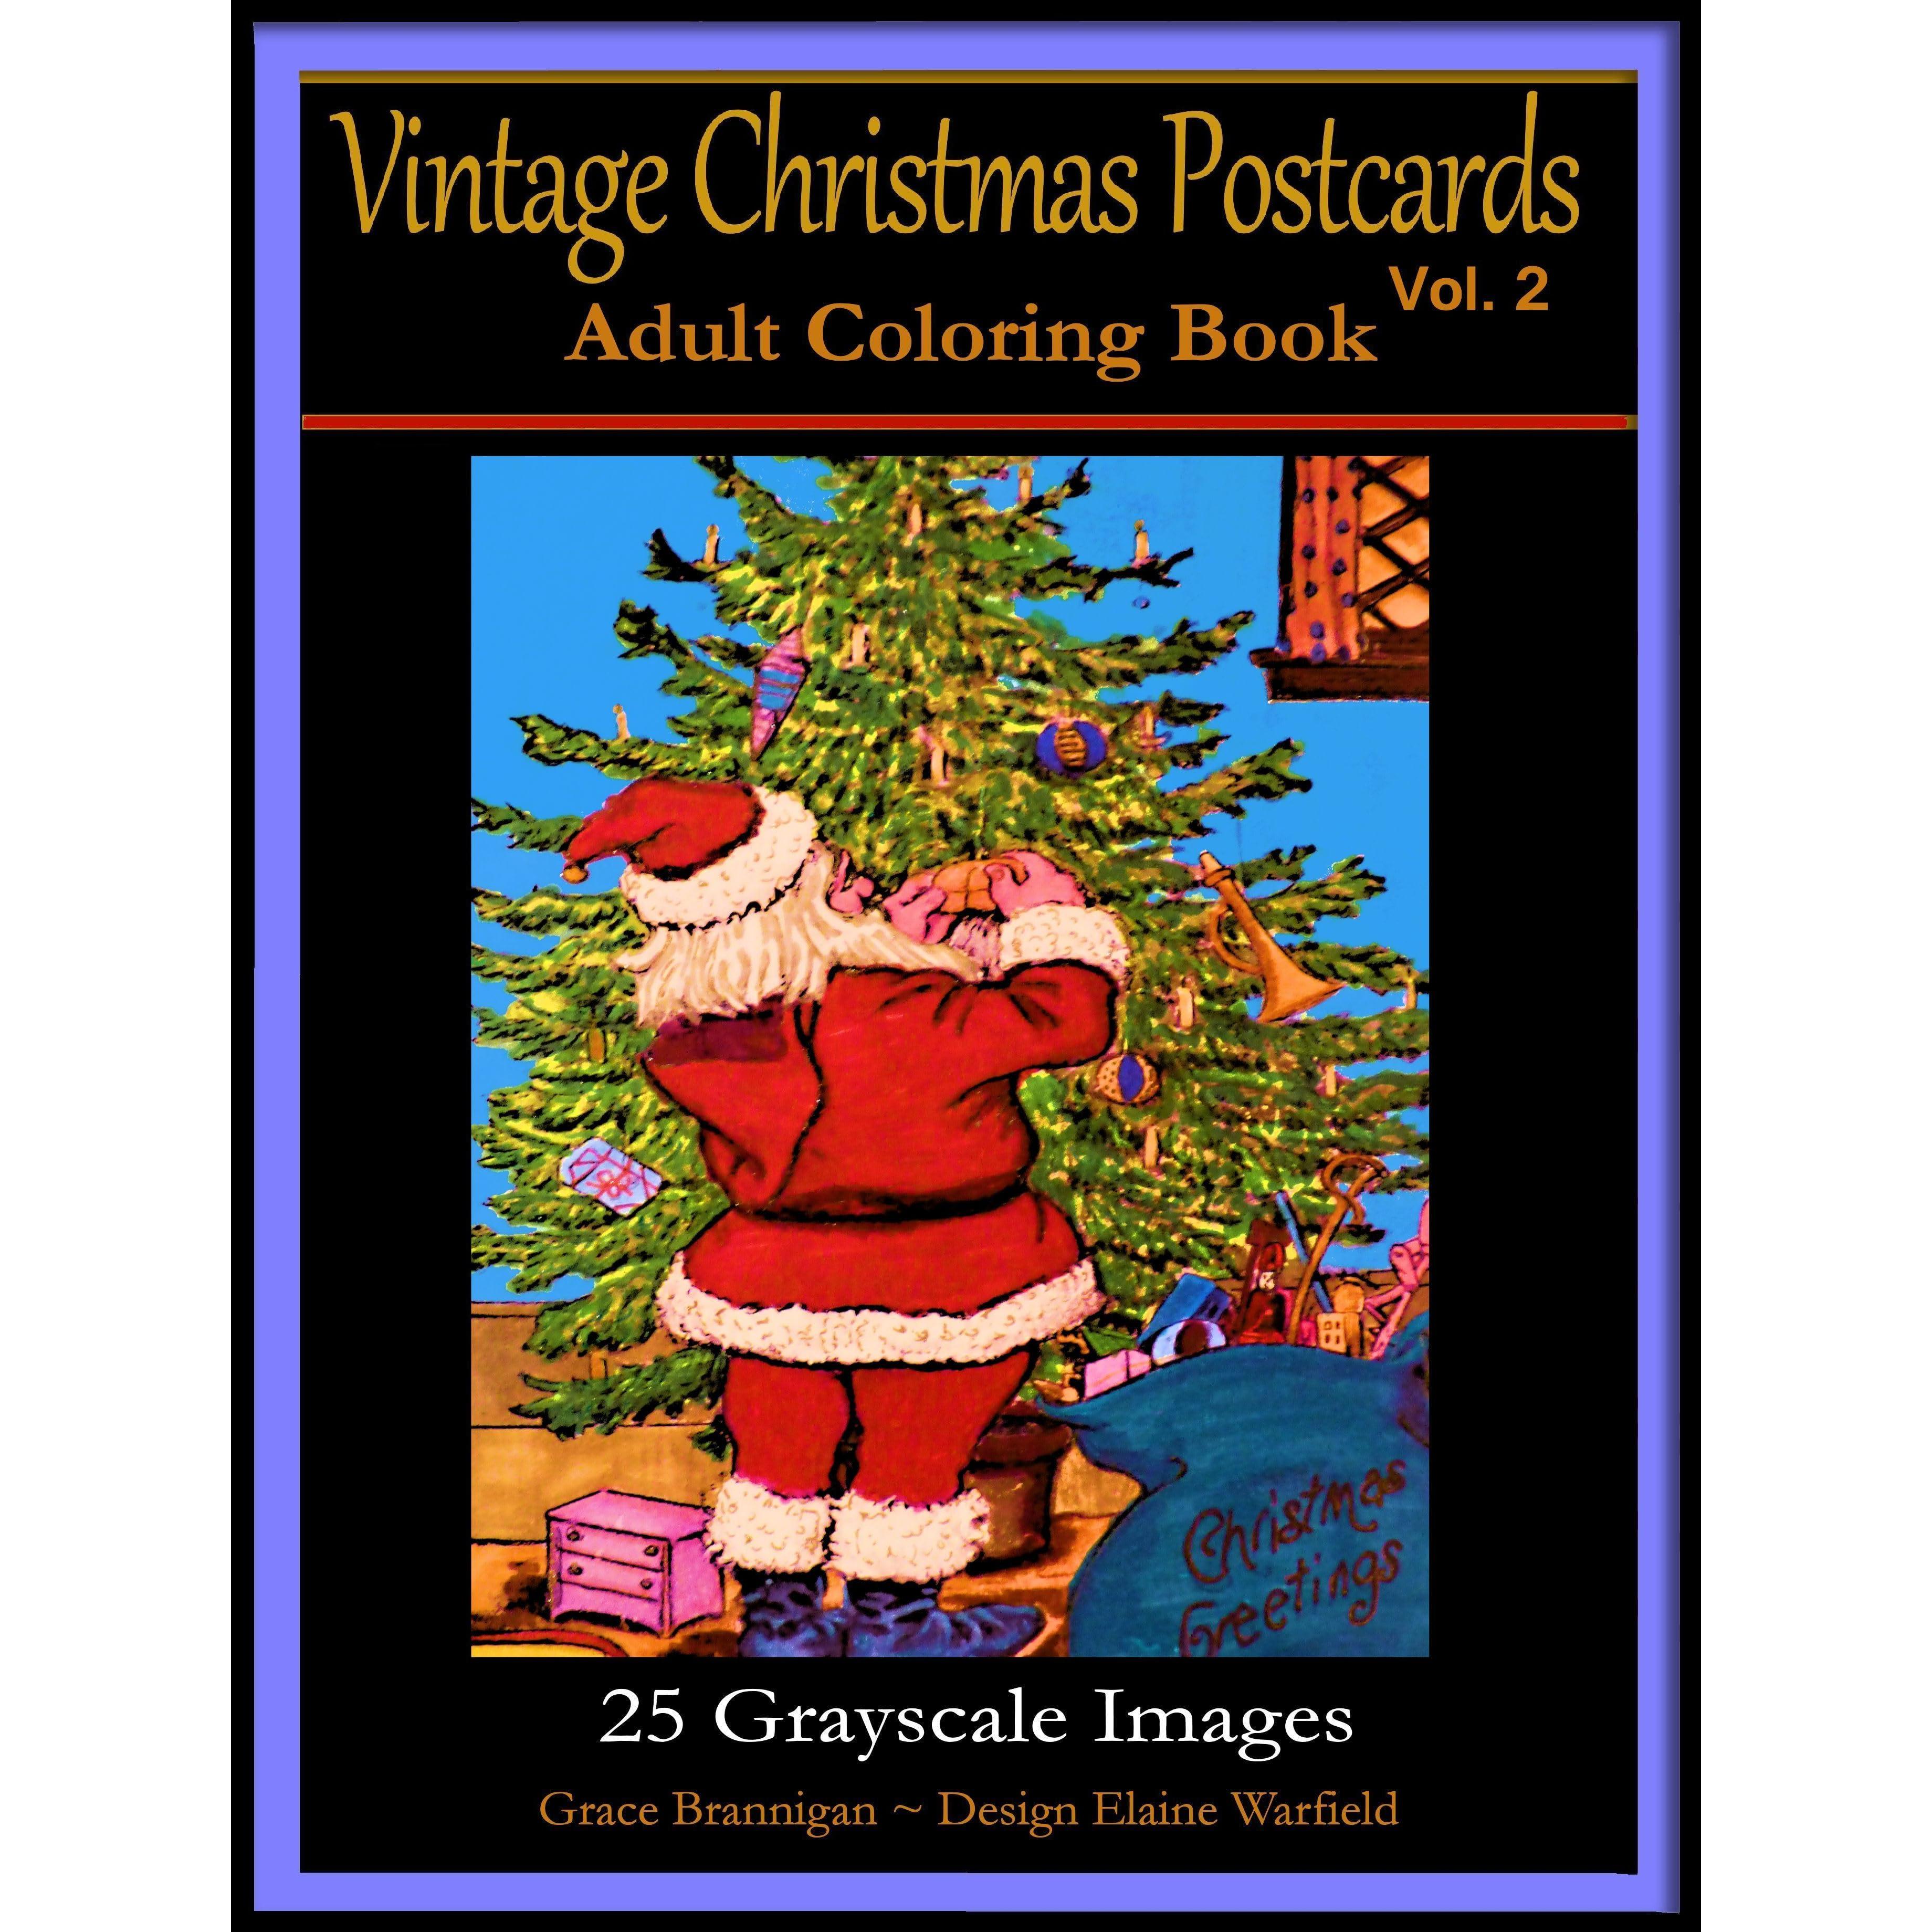 vintage christmas postcards vol 2 adult coloring book 25 grayscale images adult coloring book by grace brannigan